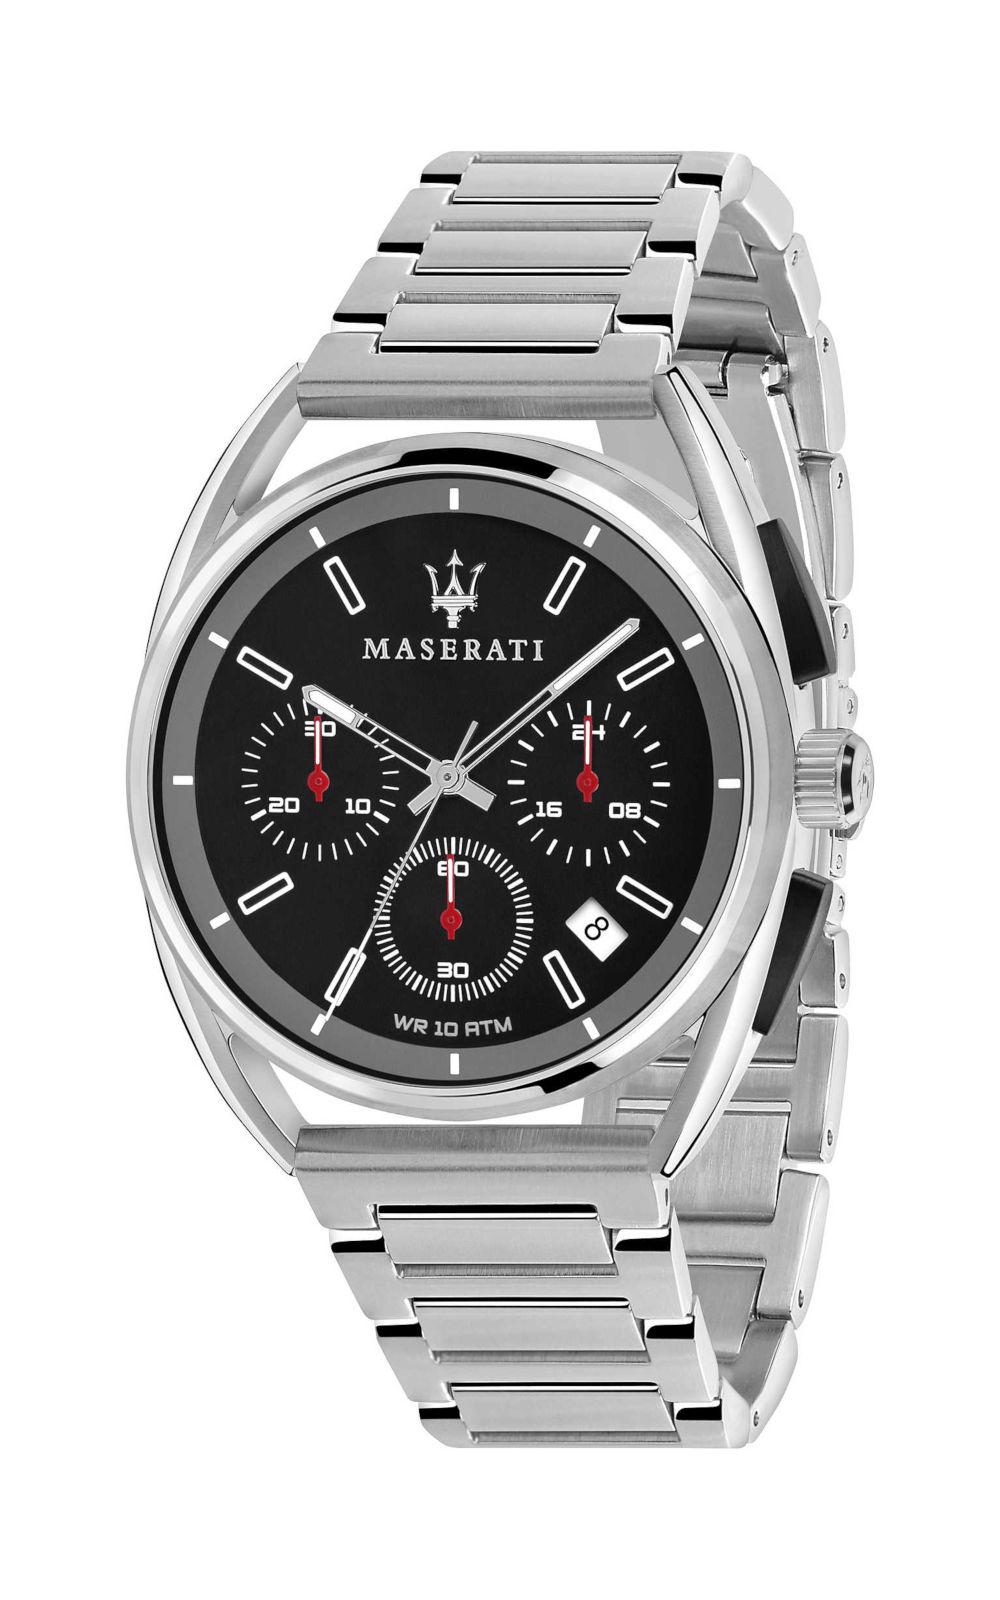 MASERATI TRIMARANO R8873632003 Ανδρικό Ρολόι Quartz Χρονογράφος Ακριβείας 326038ce087